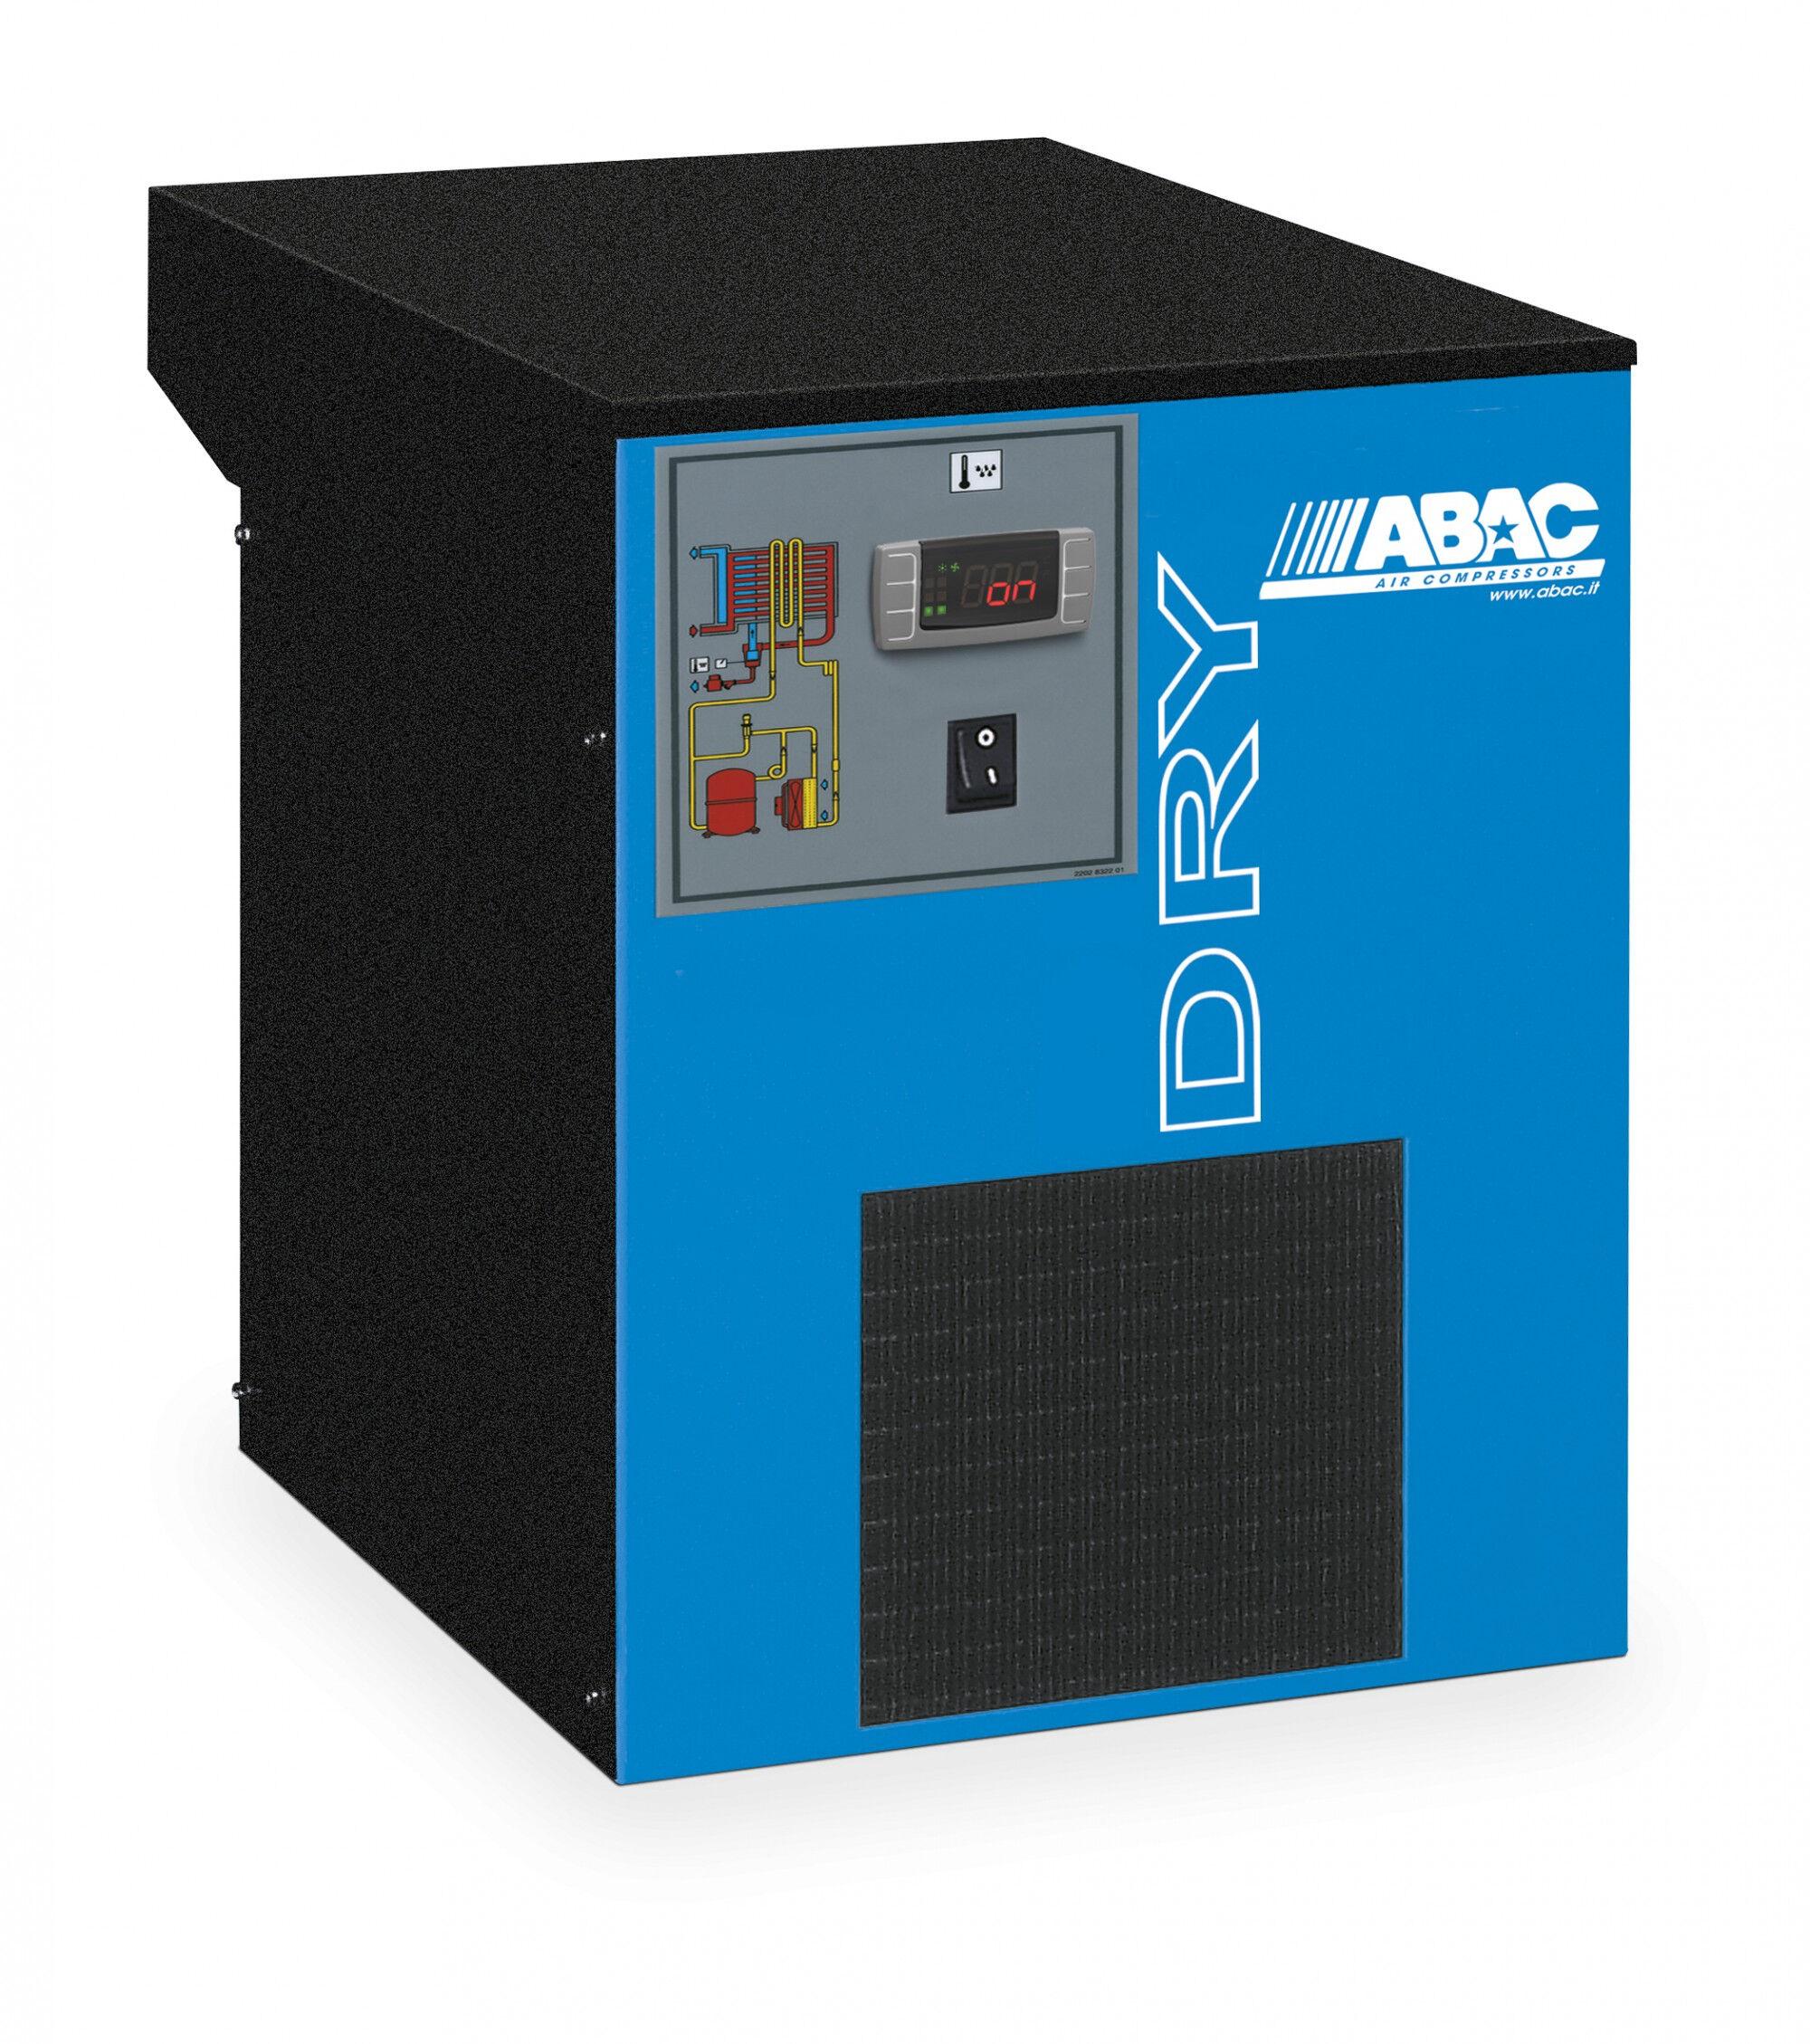 abac essiccatore dry 45 abac